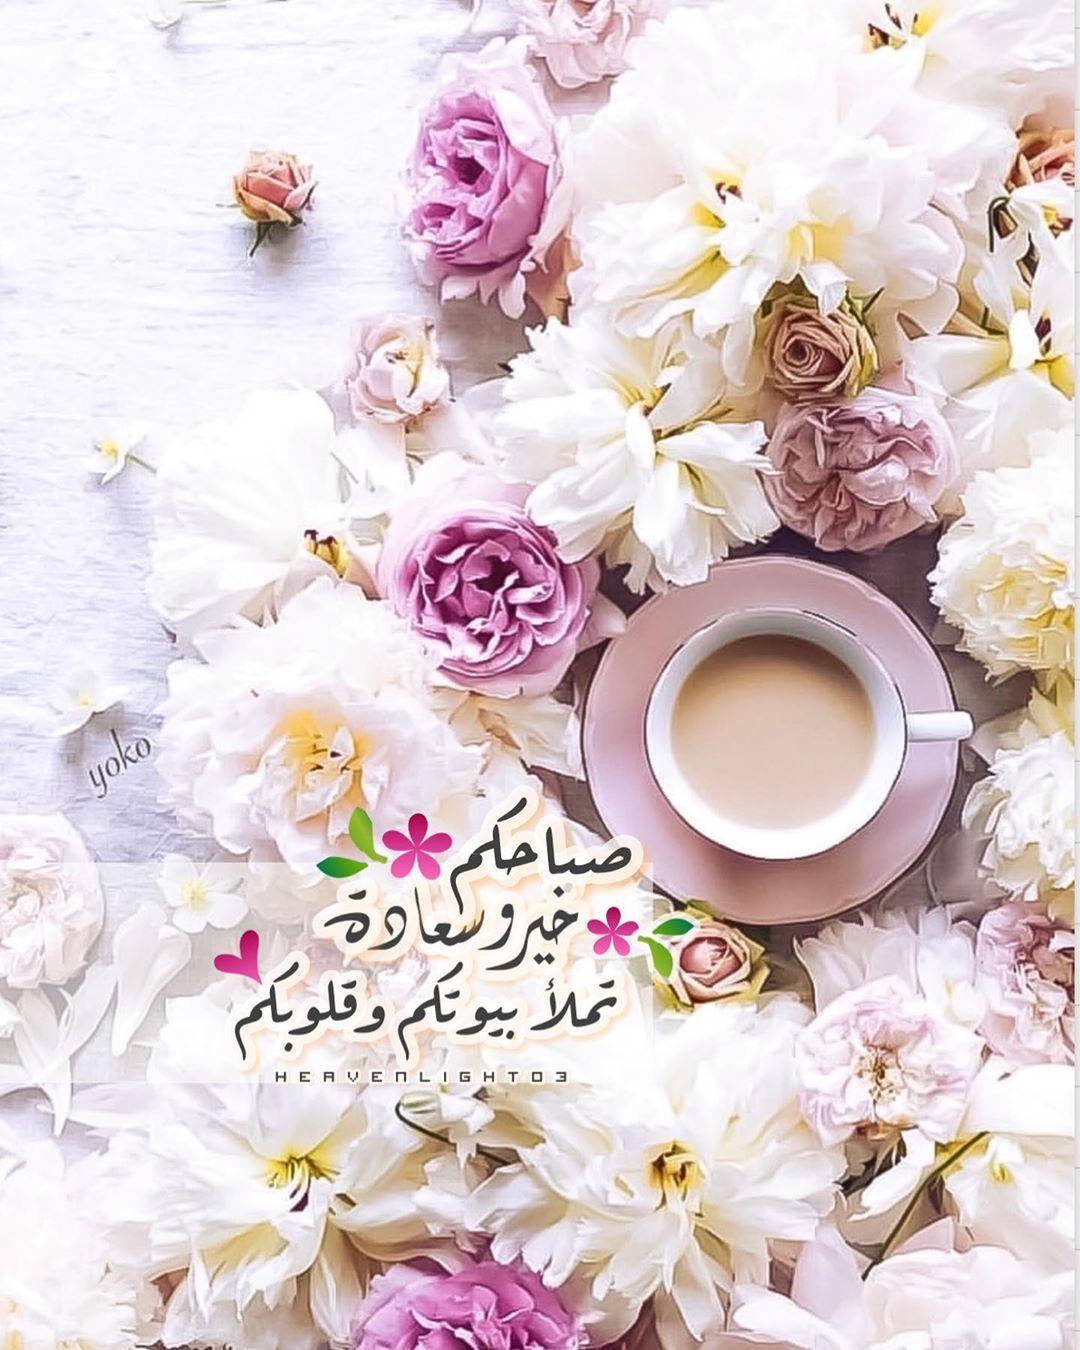 780 Likes 14 Comments Muna Heavenlight03 On Instagram صباحكم خير وسعادة ت Beautiful Morning Messages Beautiful Morning Morning Greeting